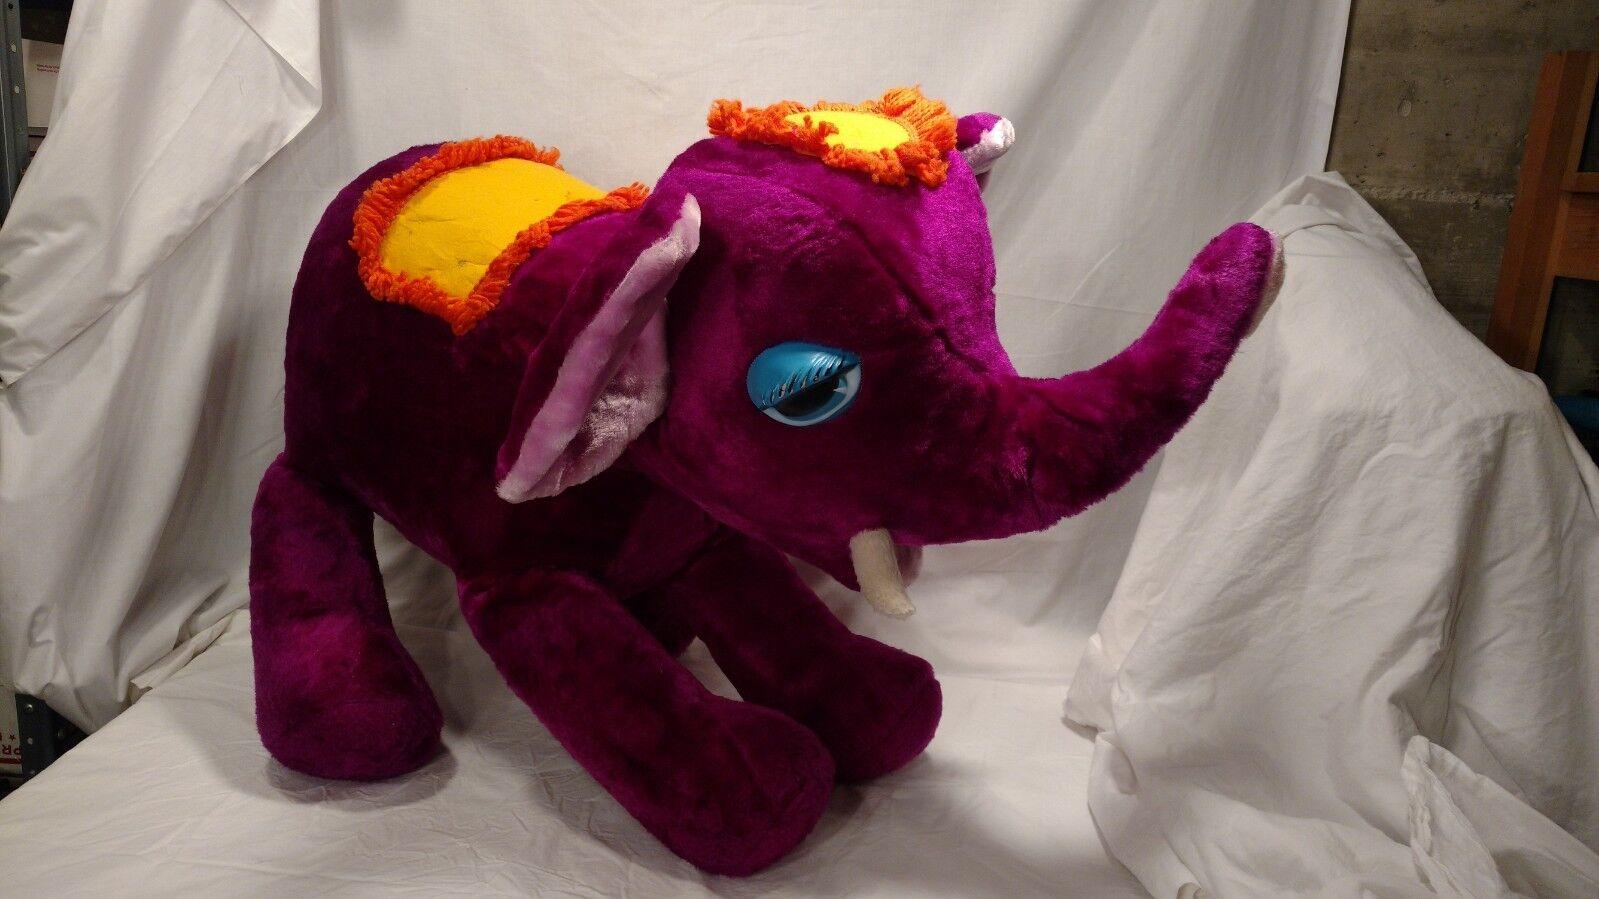 Vintage Purple Circus Elephant, Smile Novelty Toys Co., 2 Feet Tall, Stuffed